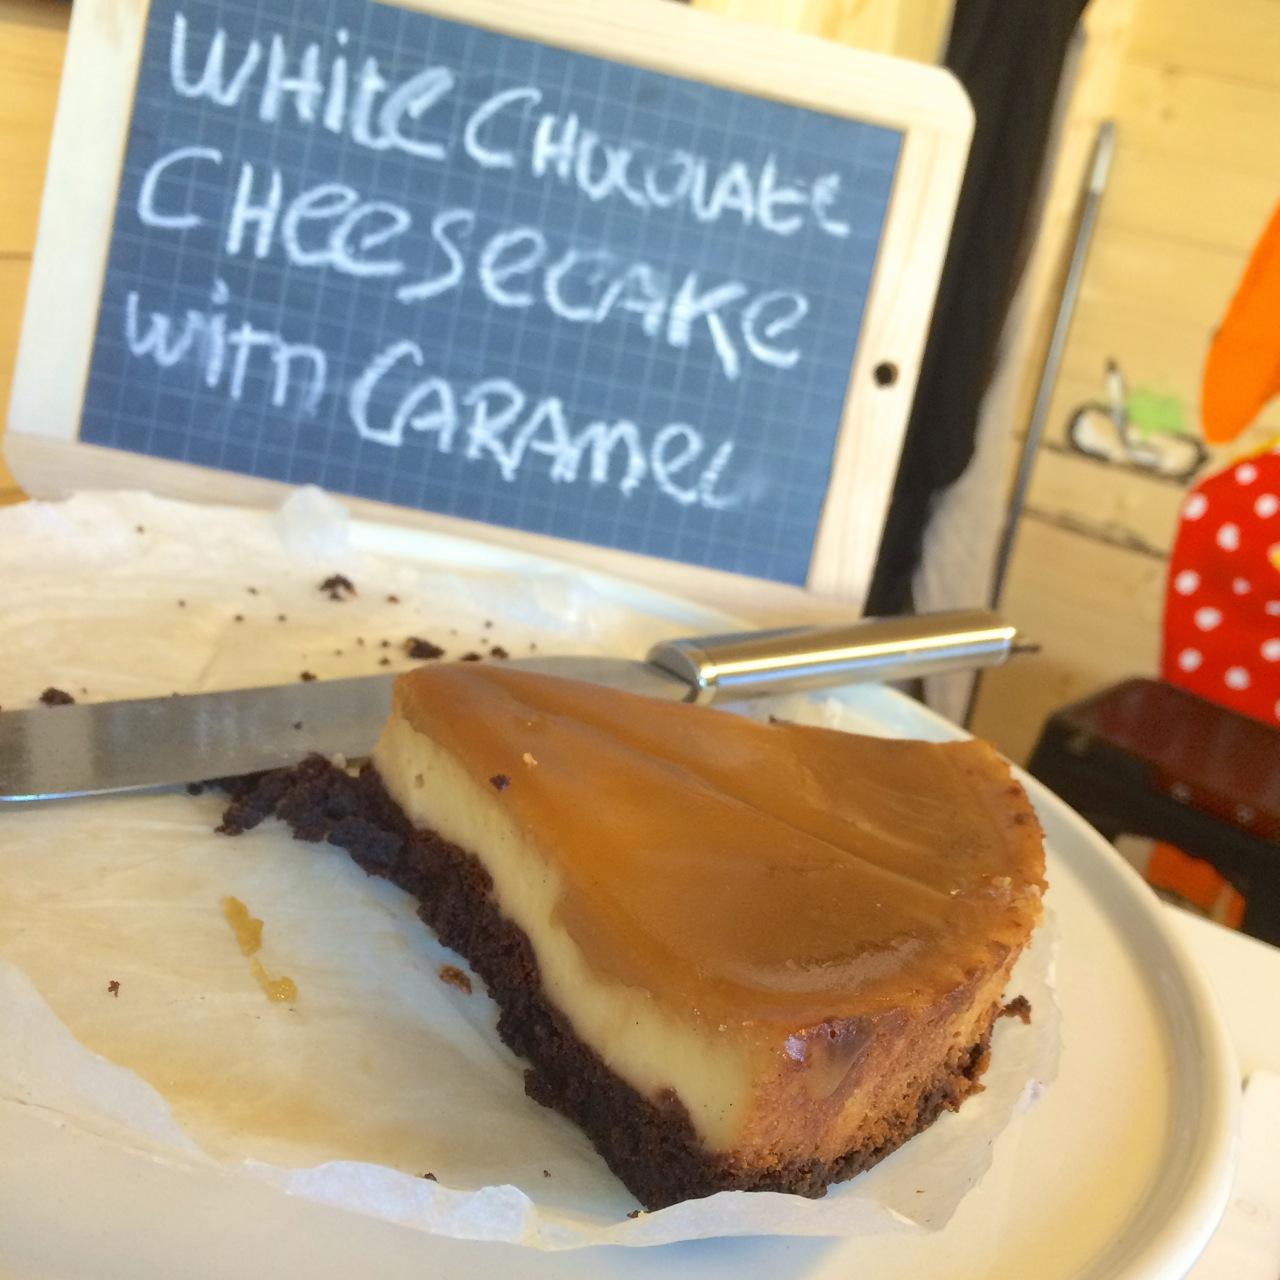 http://i2.wp.com/fatgayvegan.com/wp-content/uploads/2015/06/white-chocolate-cheesecake-with-caramel.jpg?fit=1280%2C1280